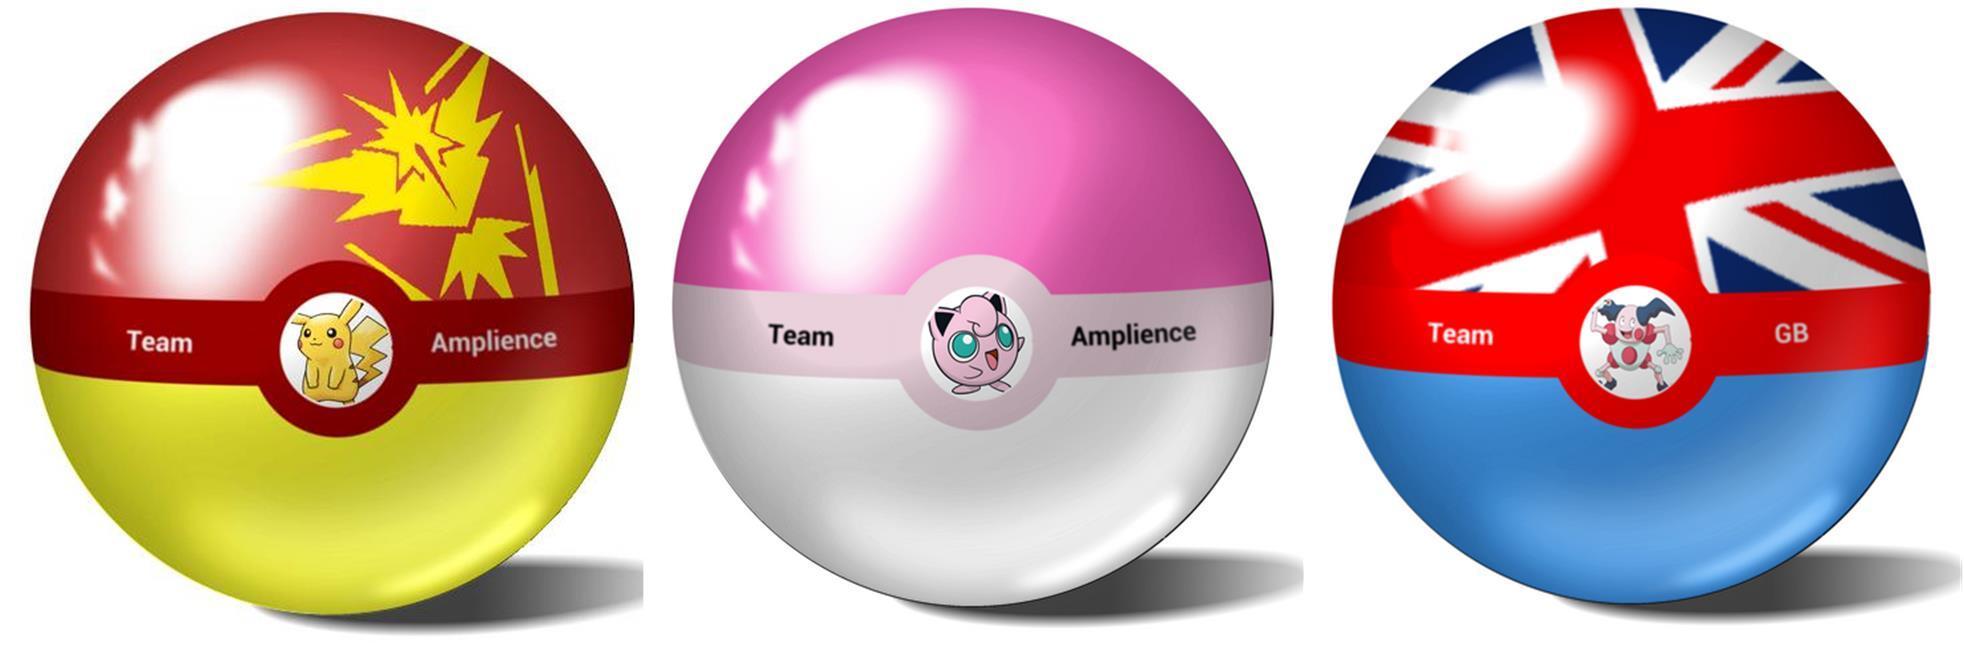 Pokeball-examples